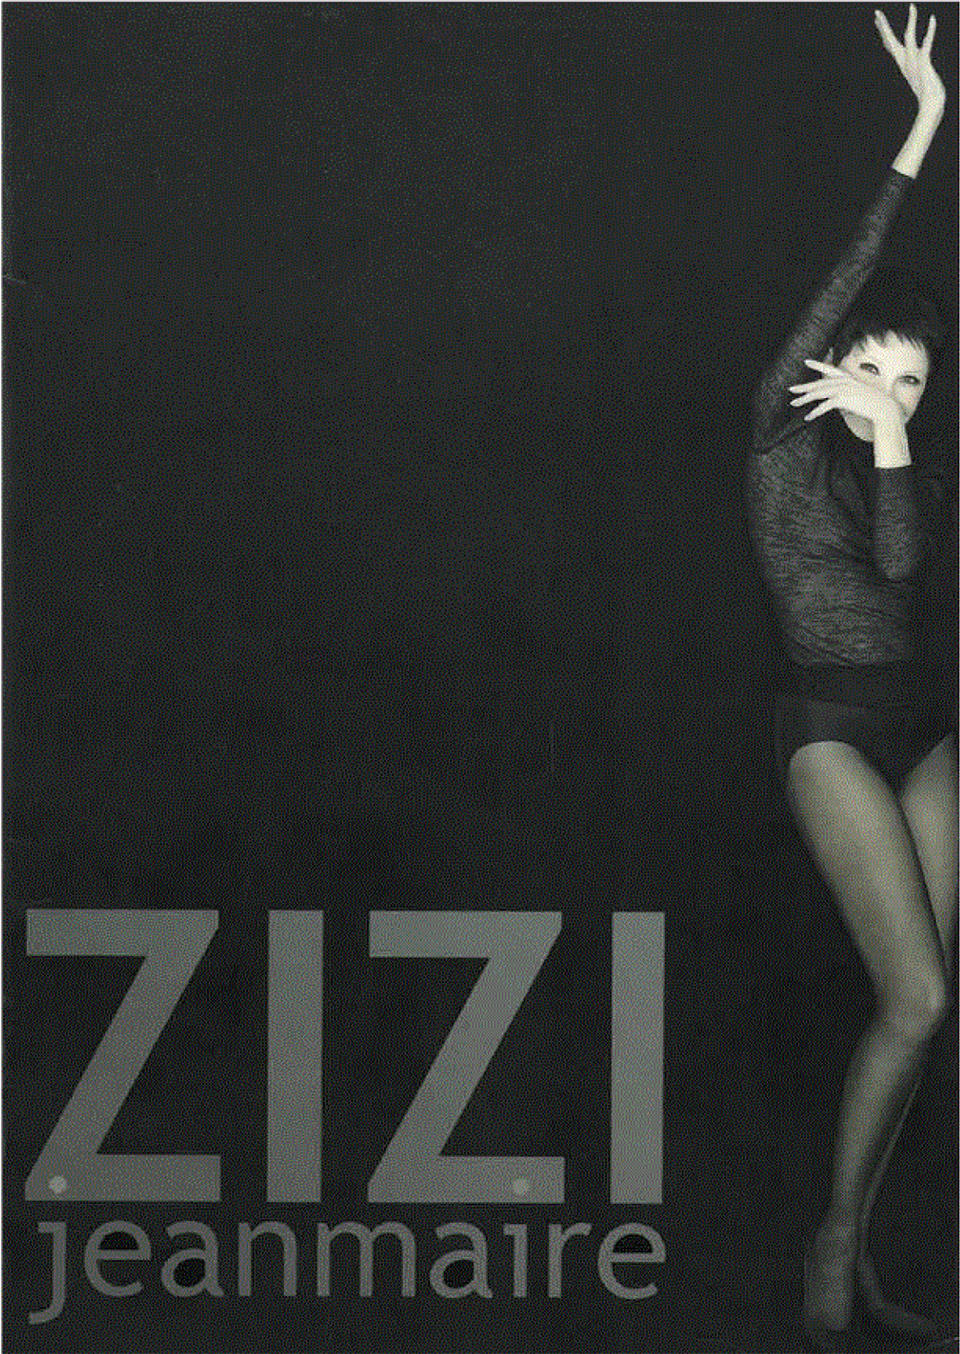 Zizi-Jeanmaire.jpg